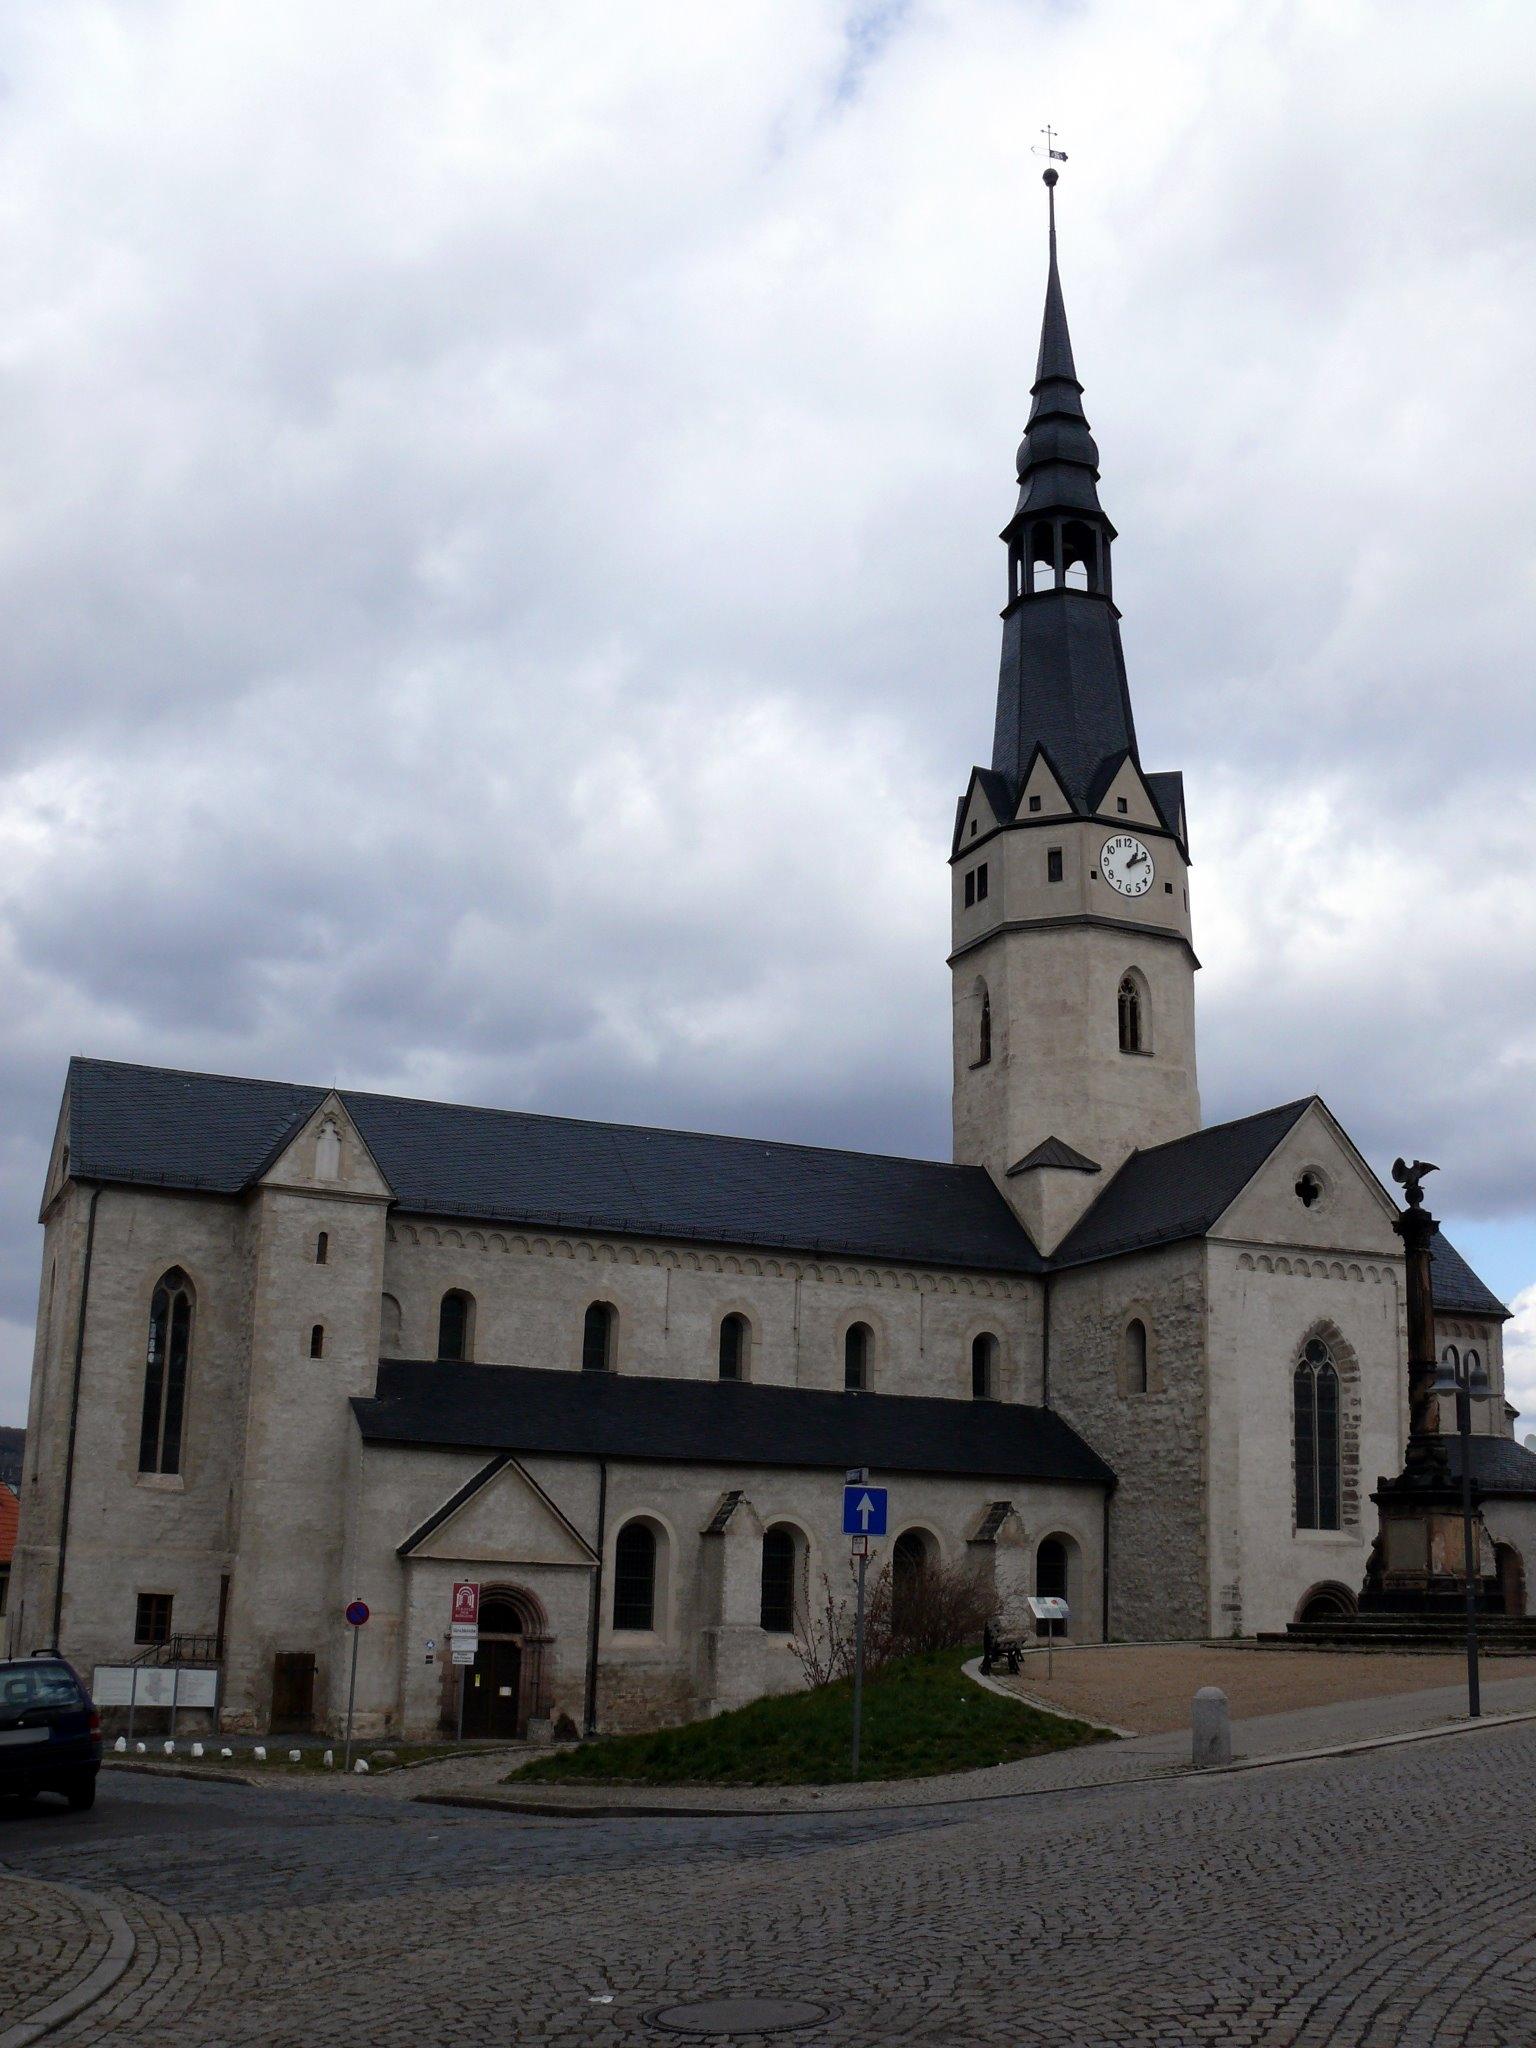 sangerhausen news